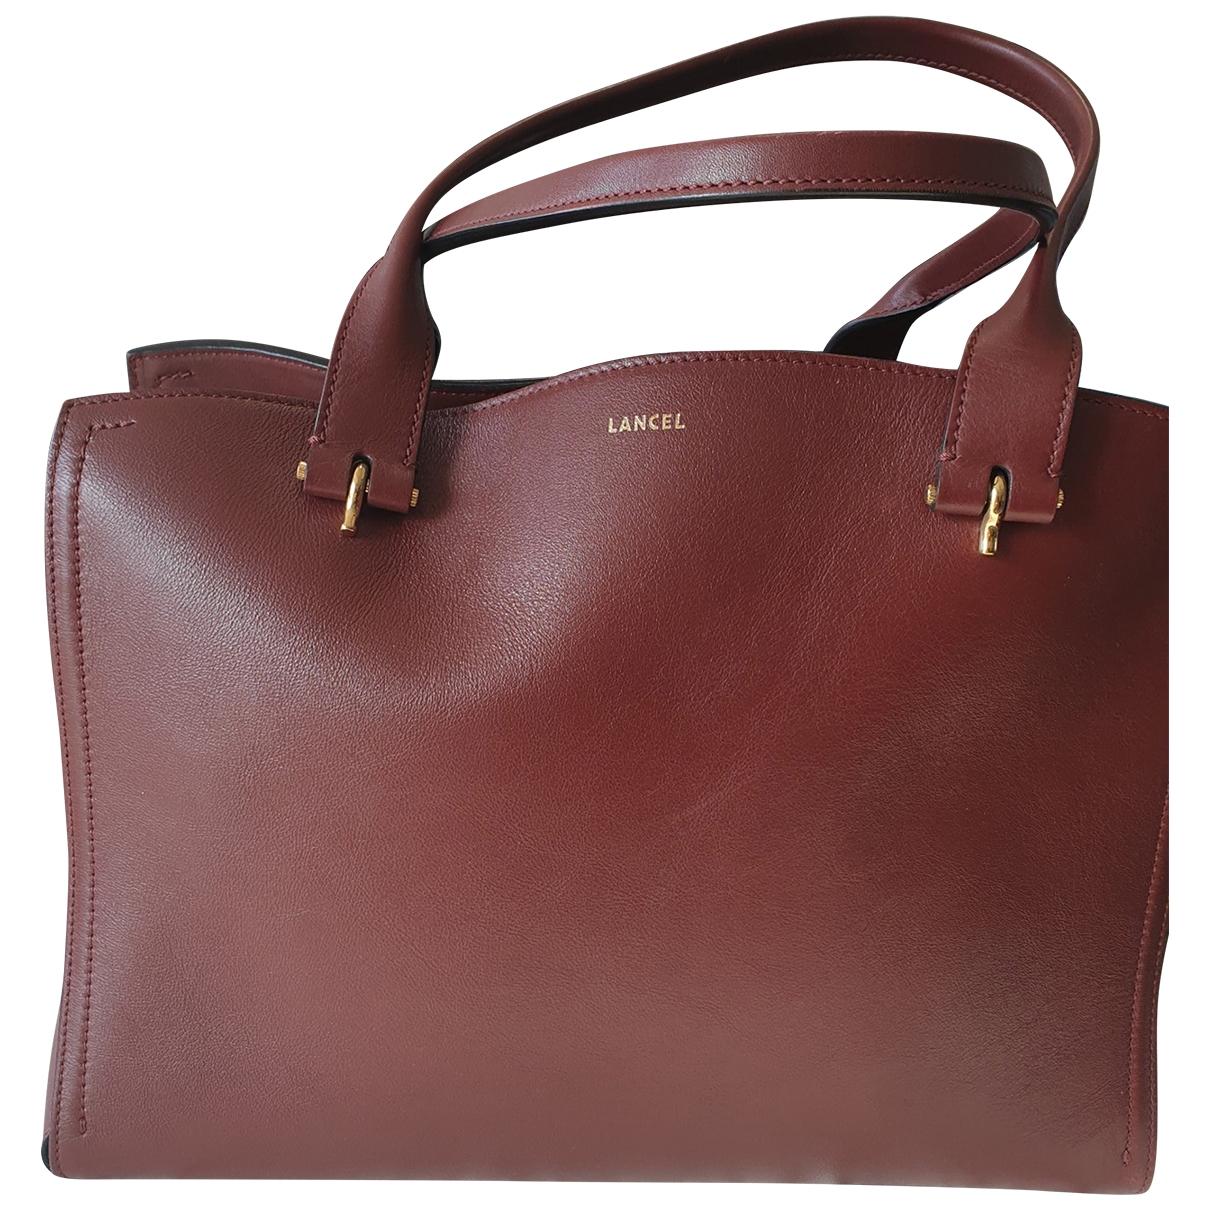 Lancel \N Burgundy Leather handbag for Women \N